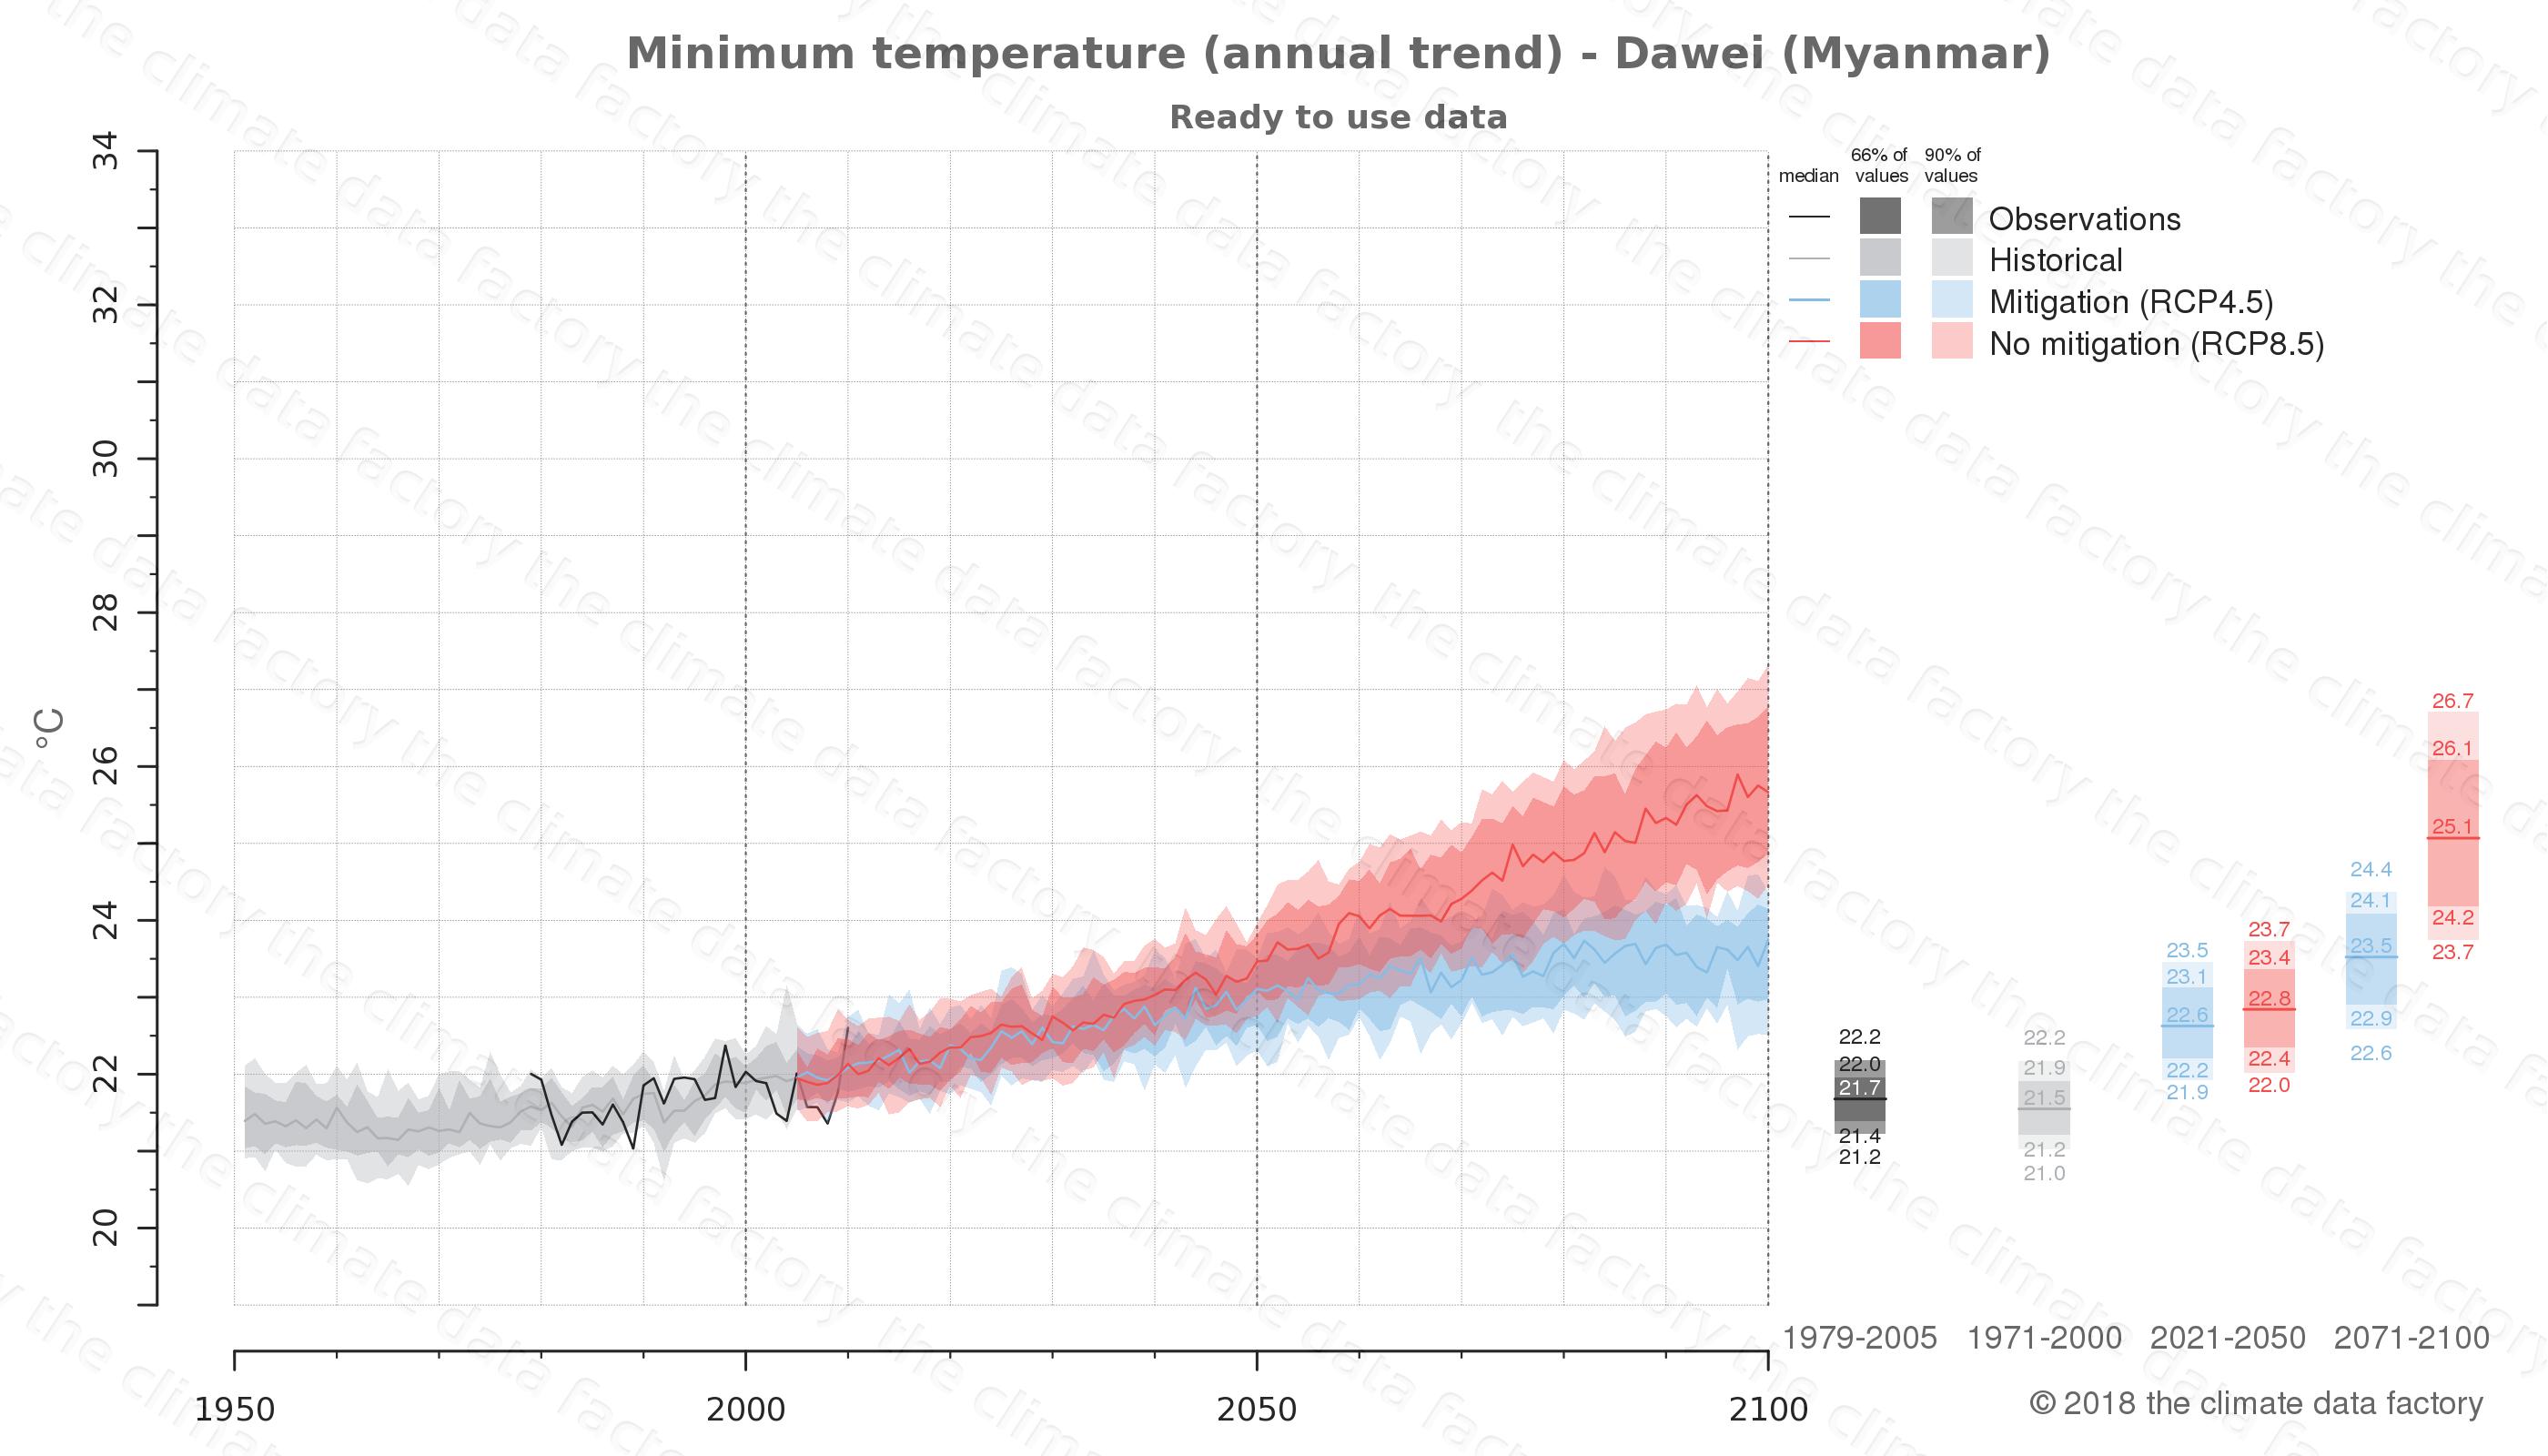 climate change data policy adaptation climate graph city data minimum-temperature dawei myanmar